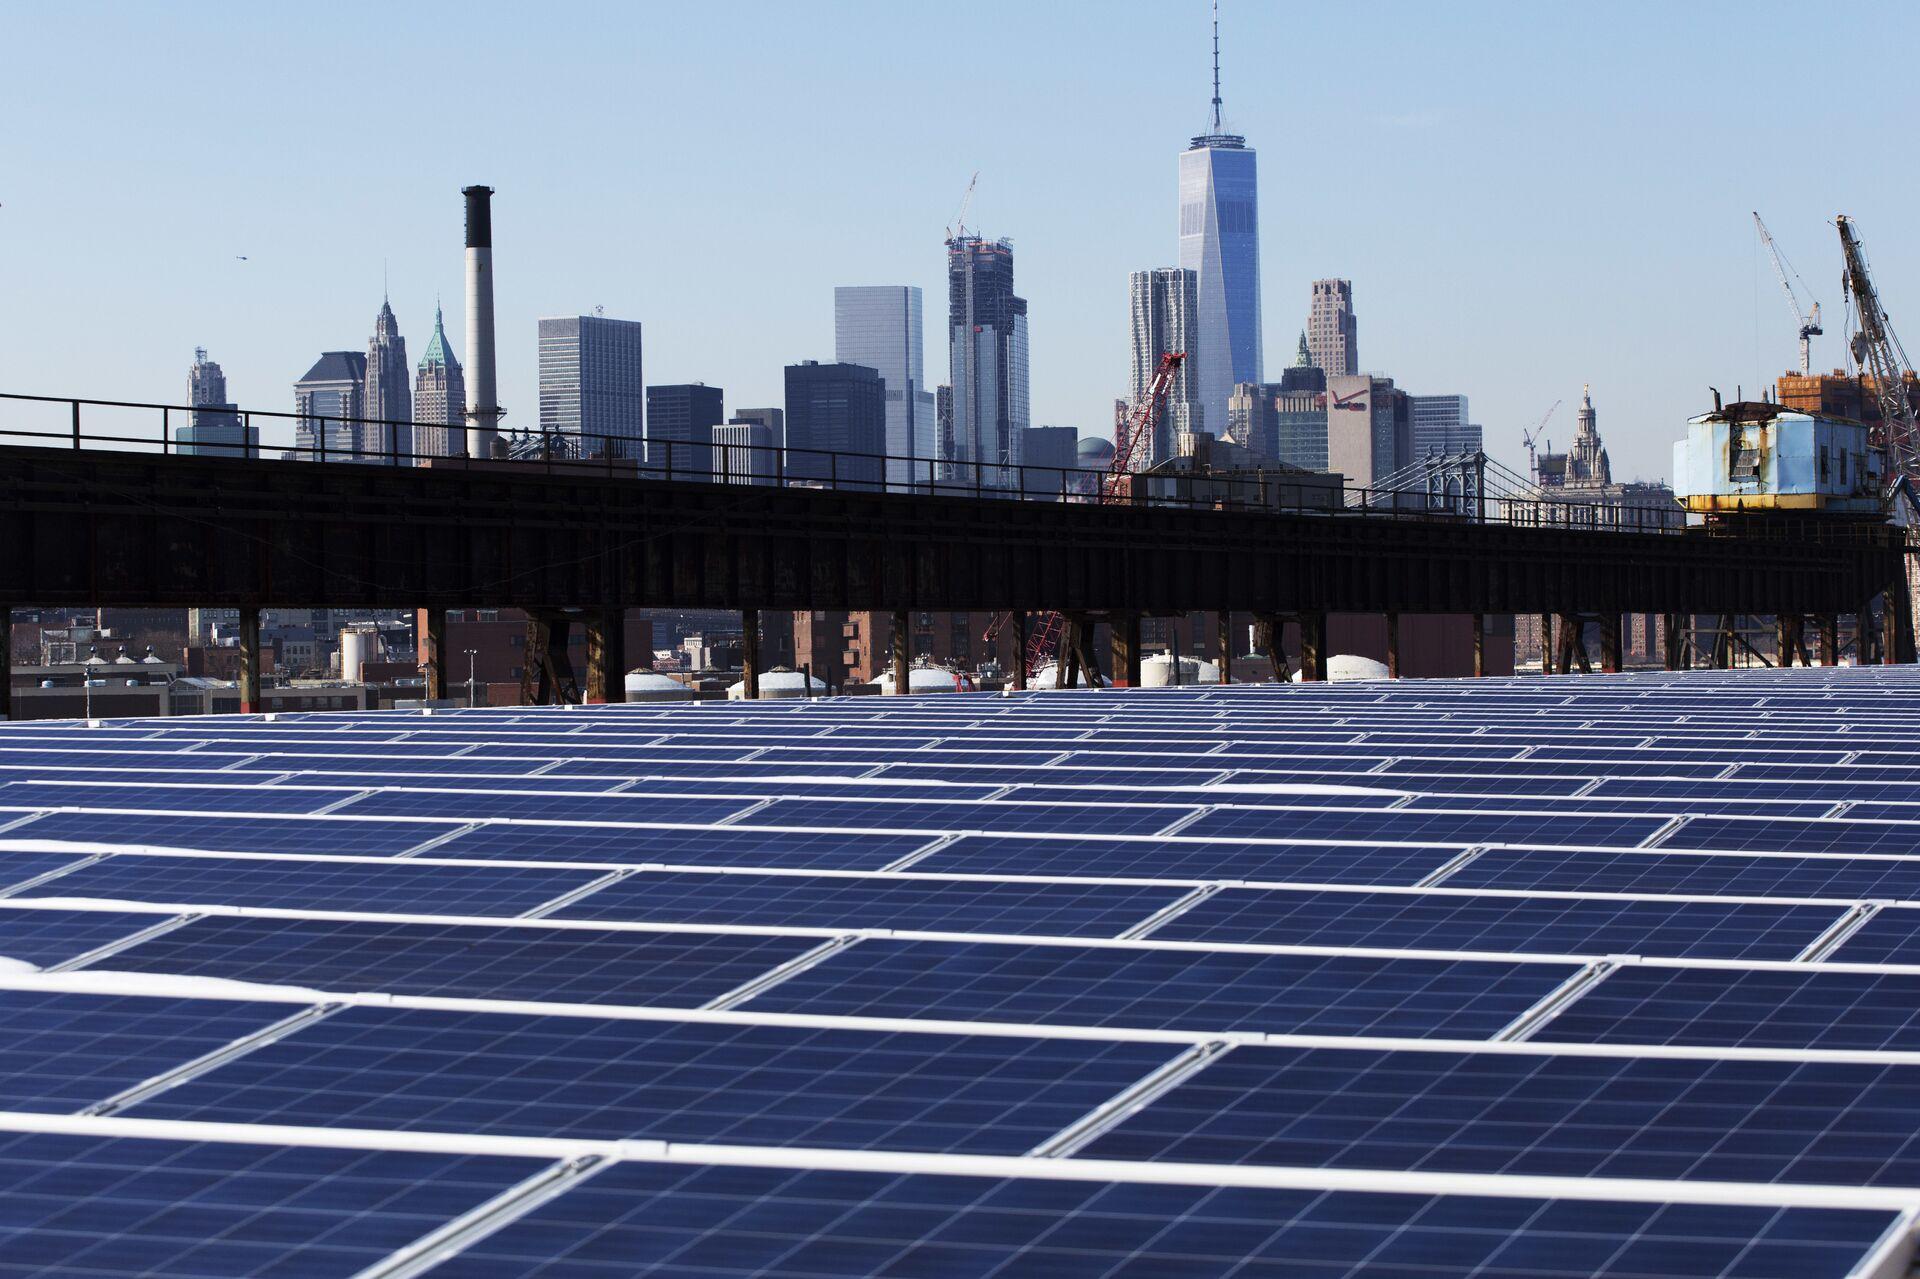 Солнечные батареи на фоне Нью-Йорка - РИА Новости, 1920, 01.12.2020